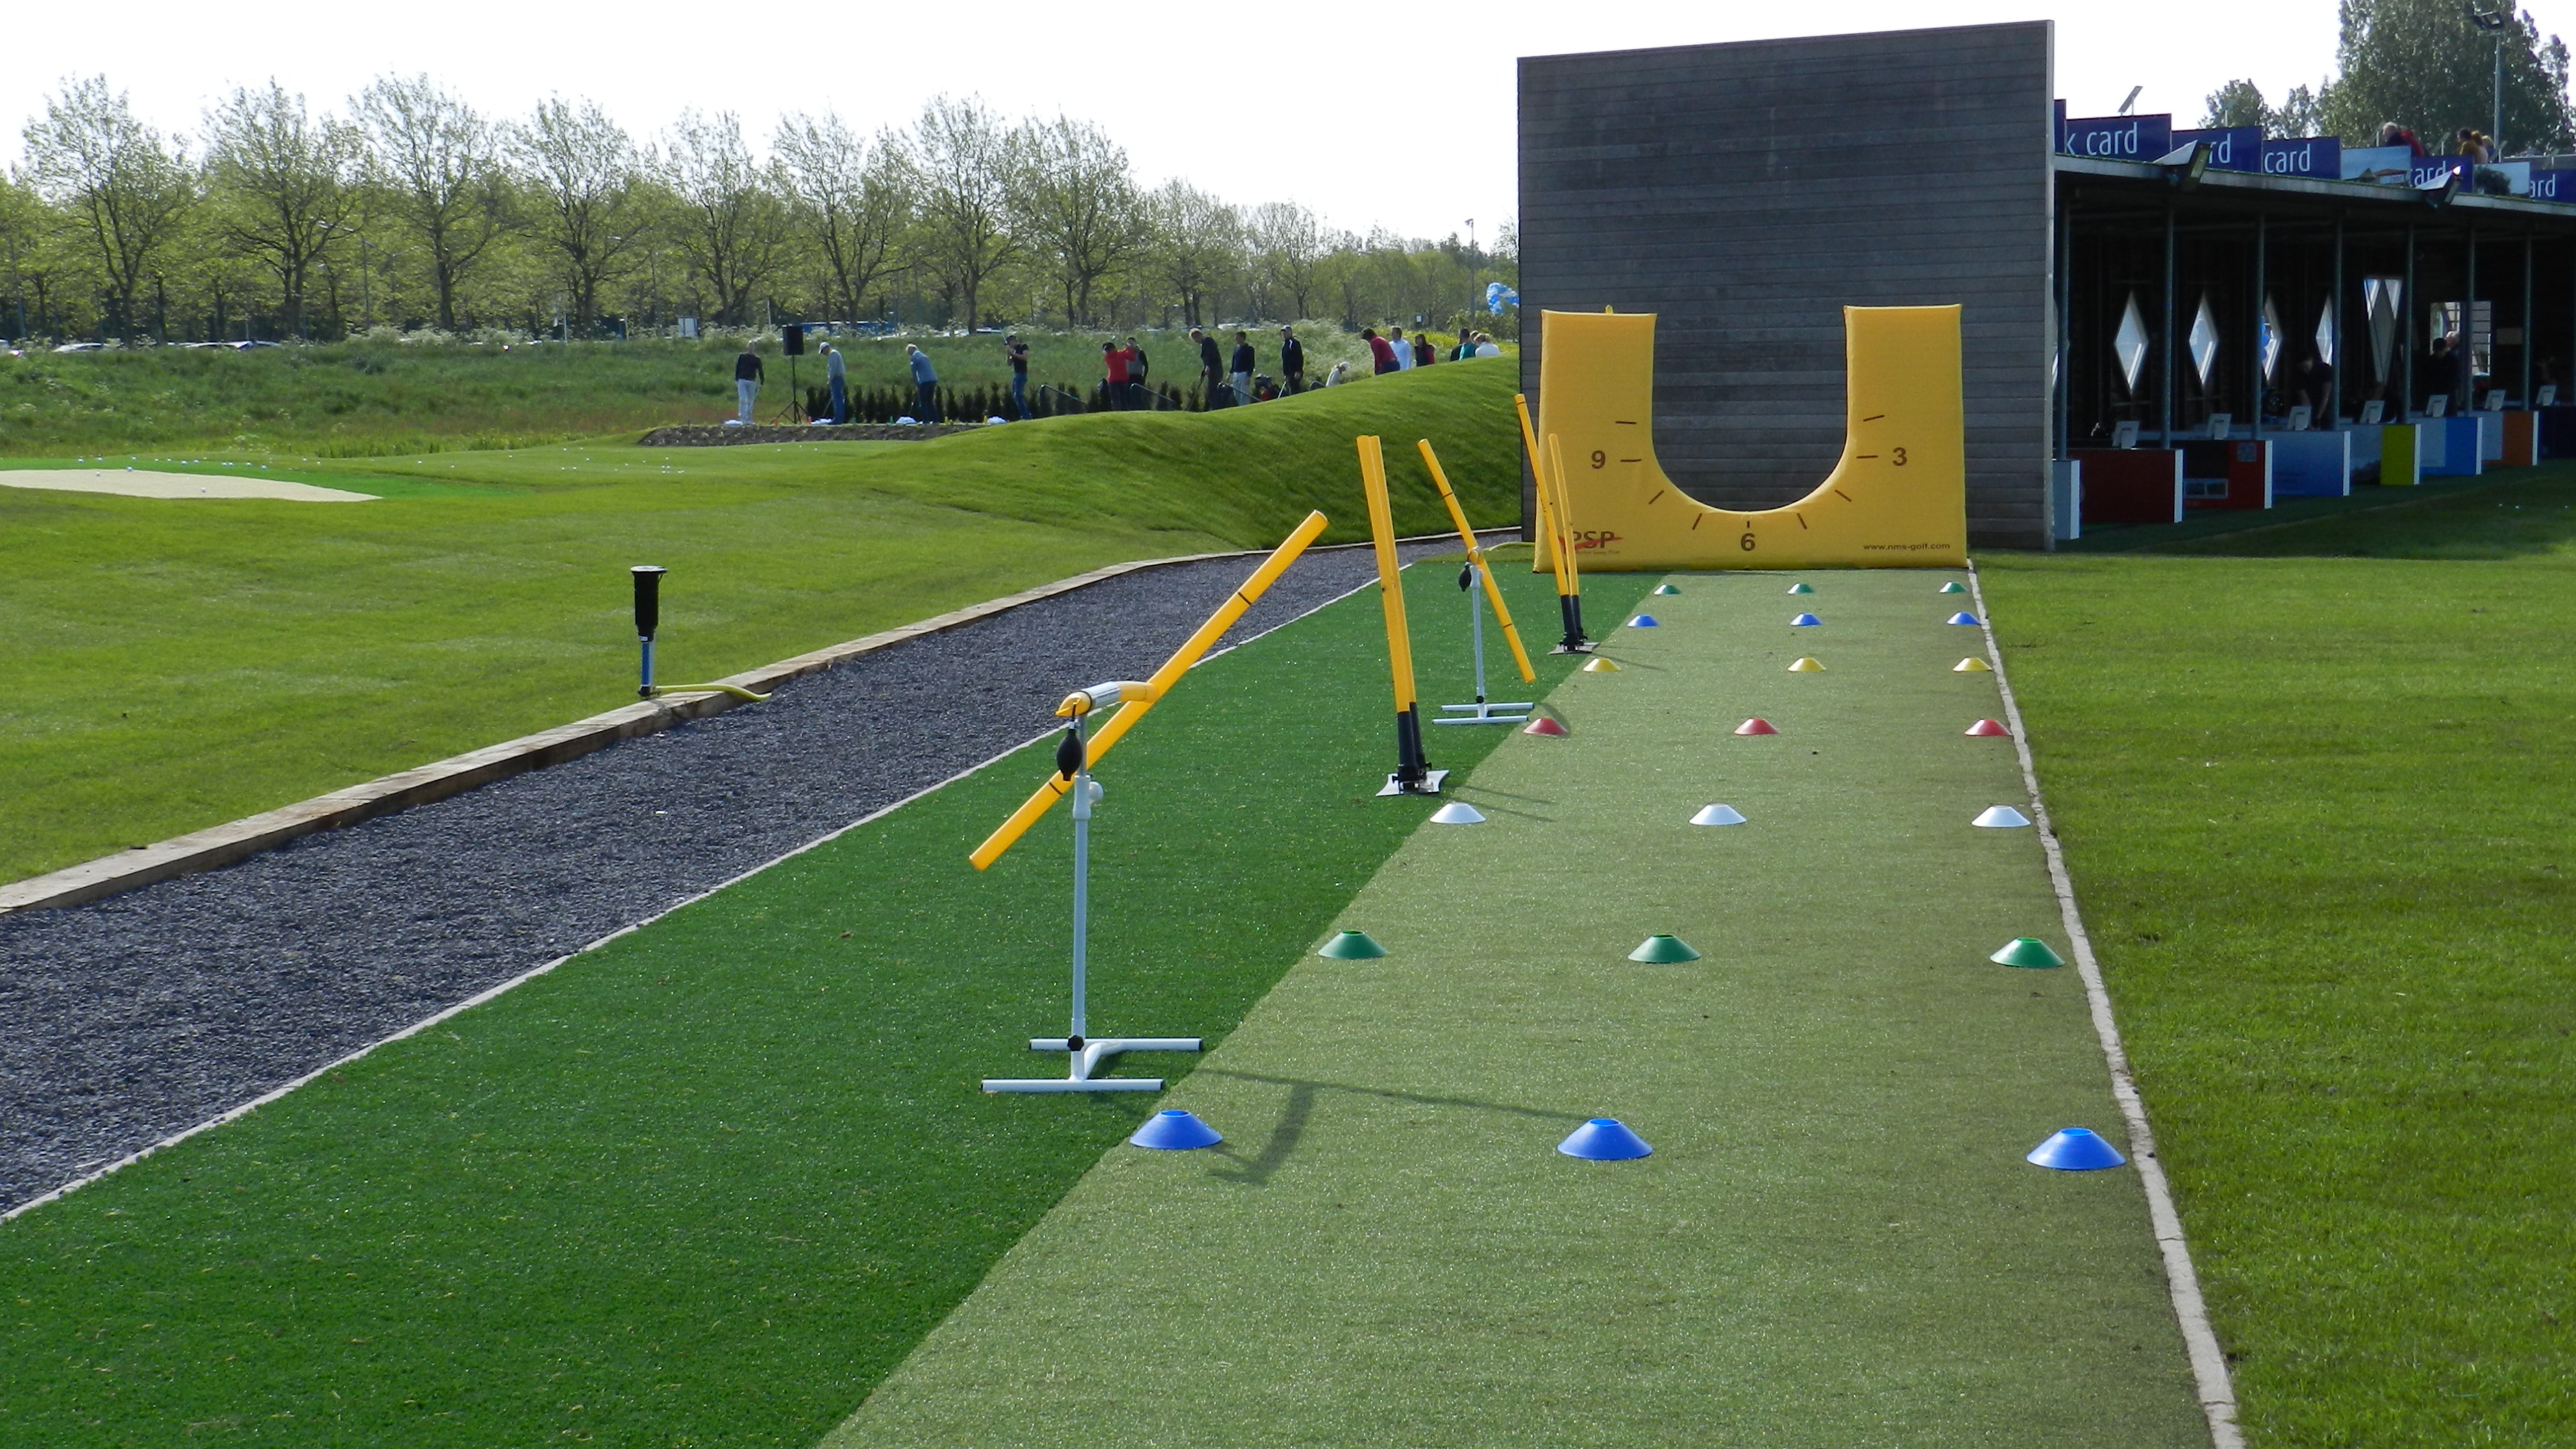 Golfclub De Hoge Dijk